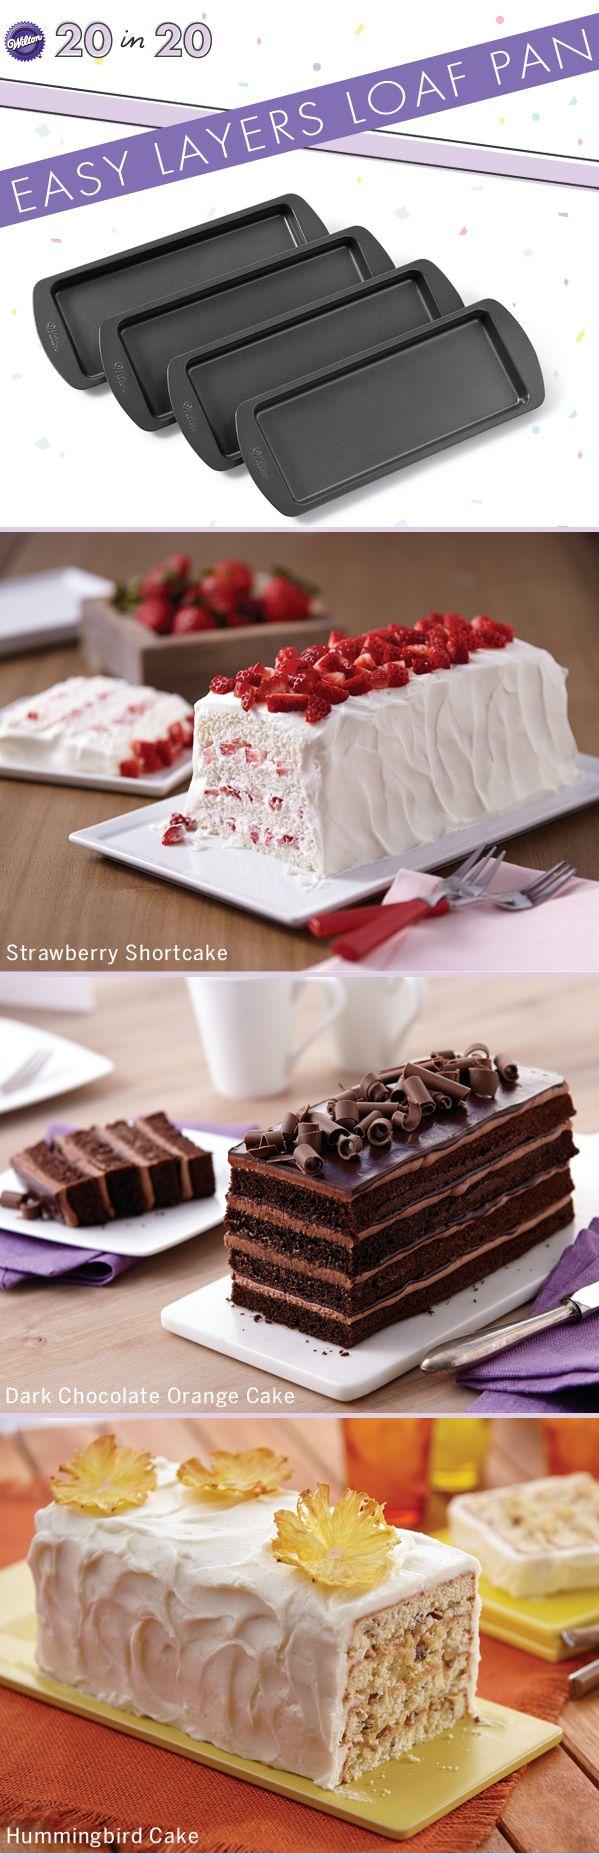 Cake Decorating Ideas Using Wilton Loaf Pan